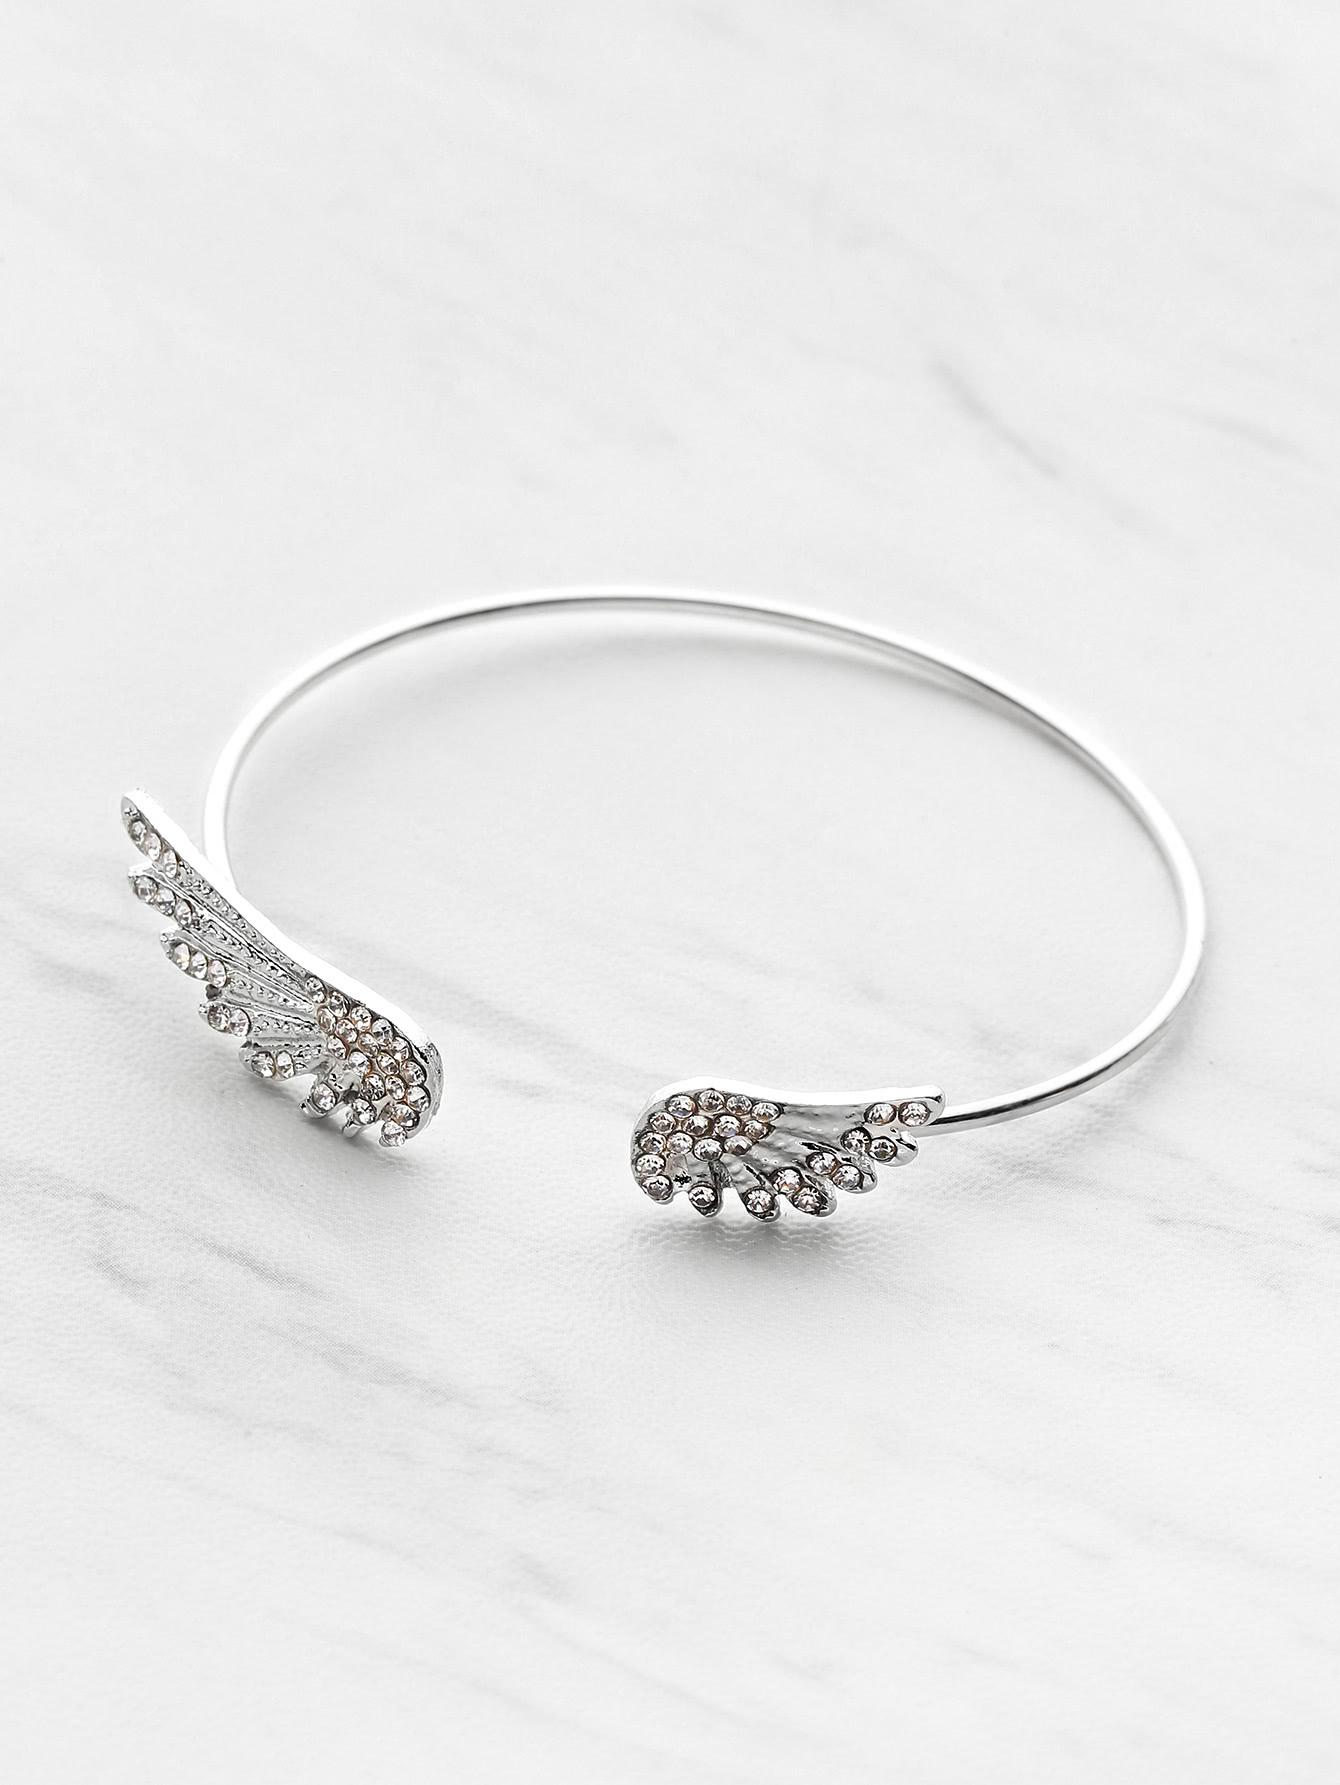 Rhinestone Embellished Wing Design Cuff Bracelet wing design chain bracelet